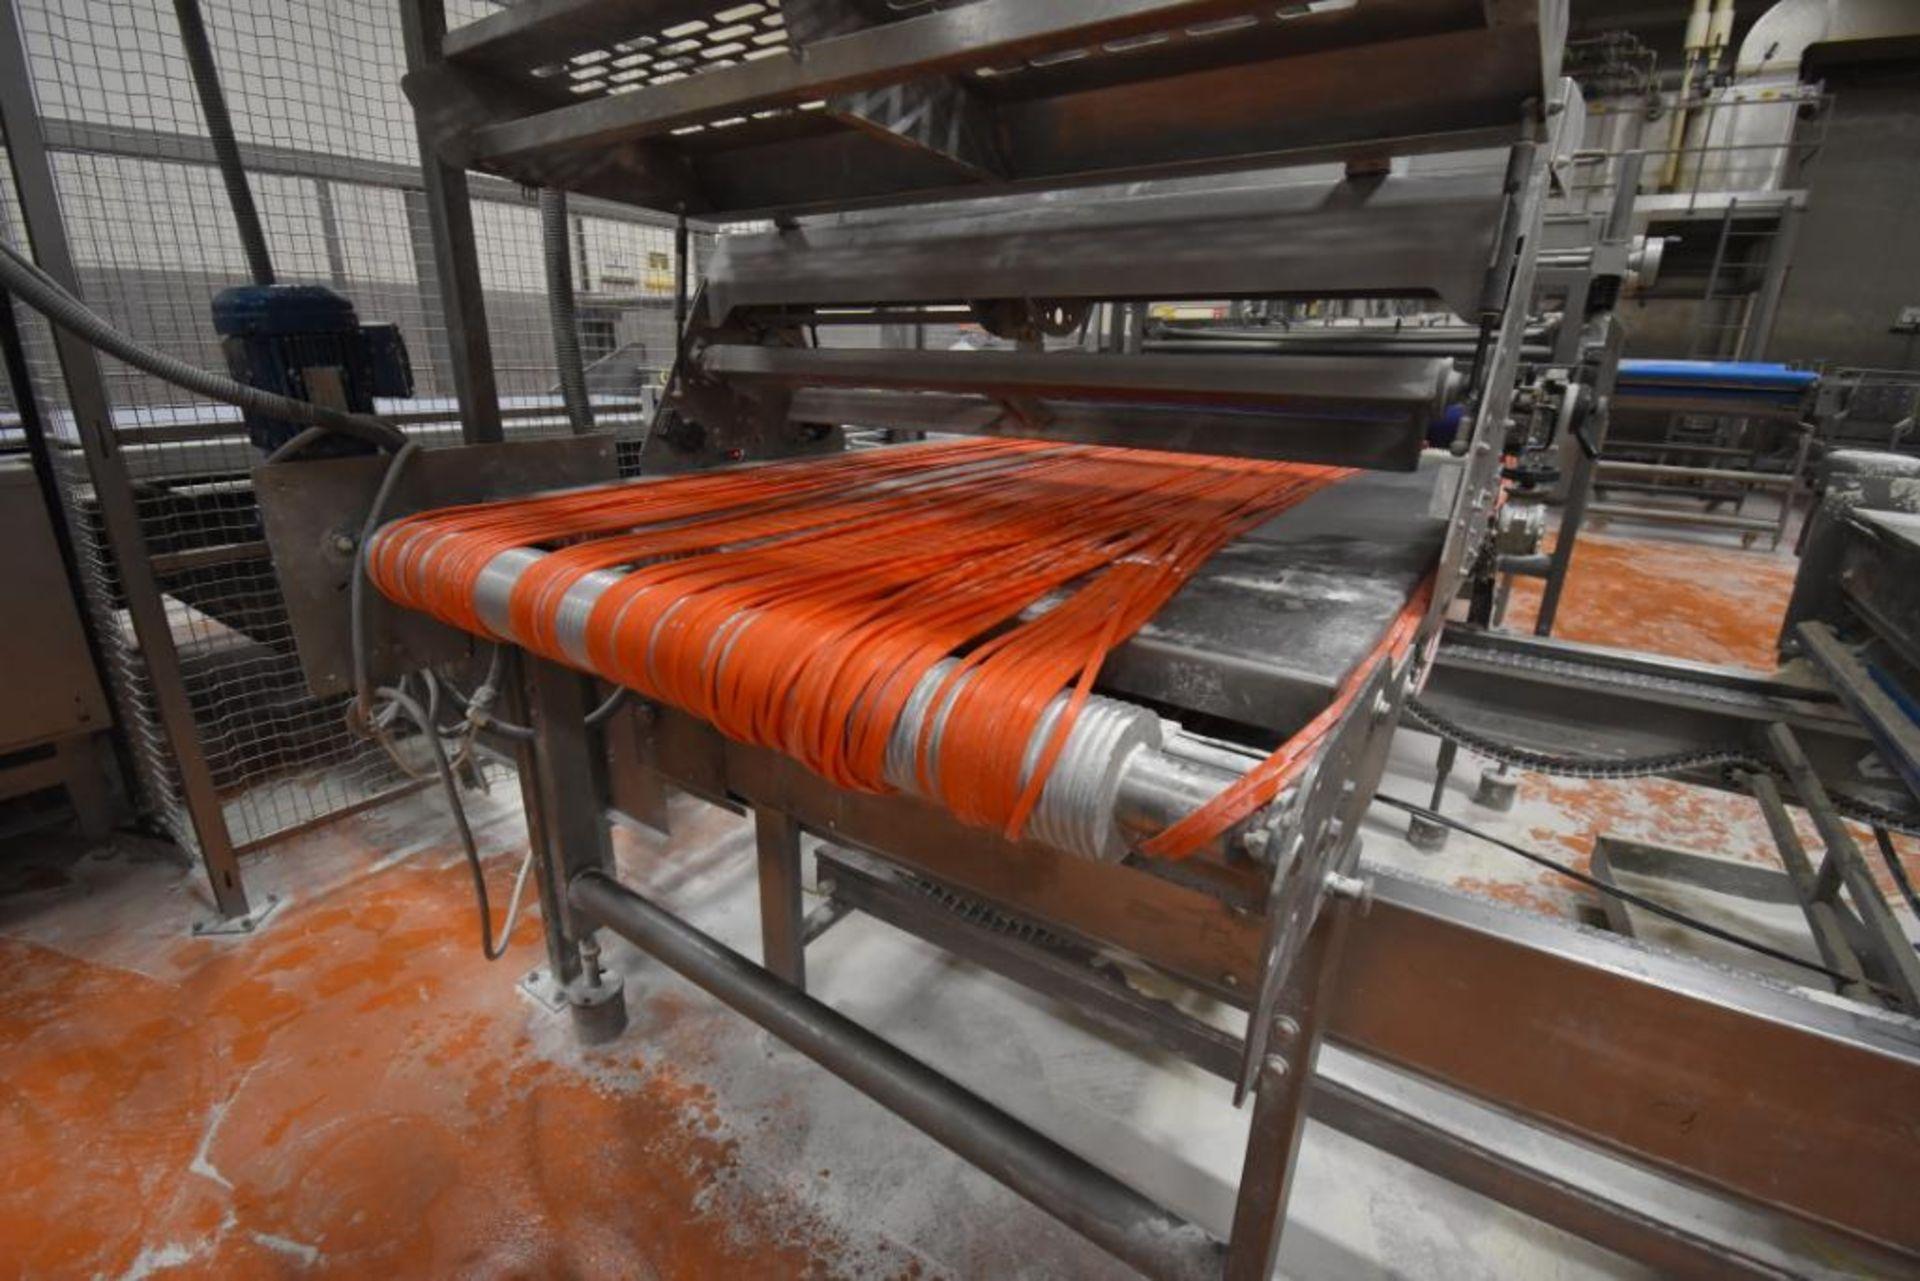 2007 Fritsch Laminator 3000 dough line - Image 178 of 280